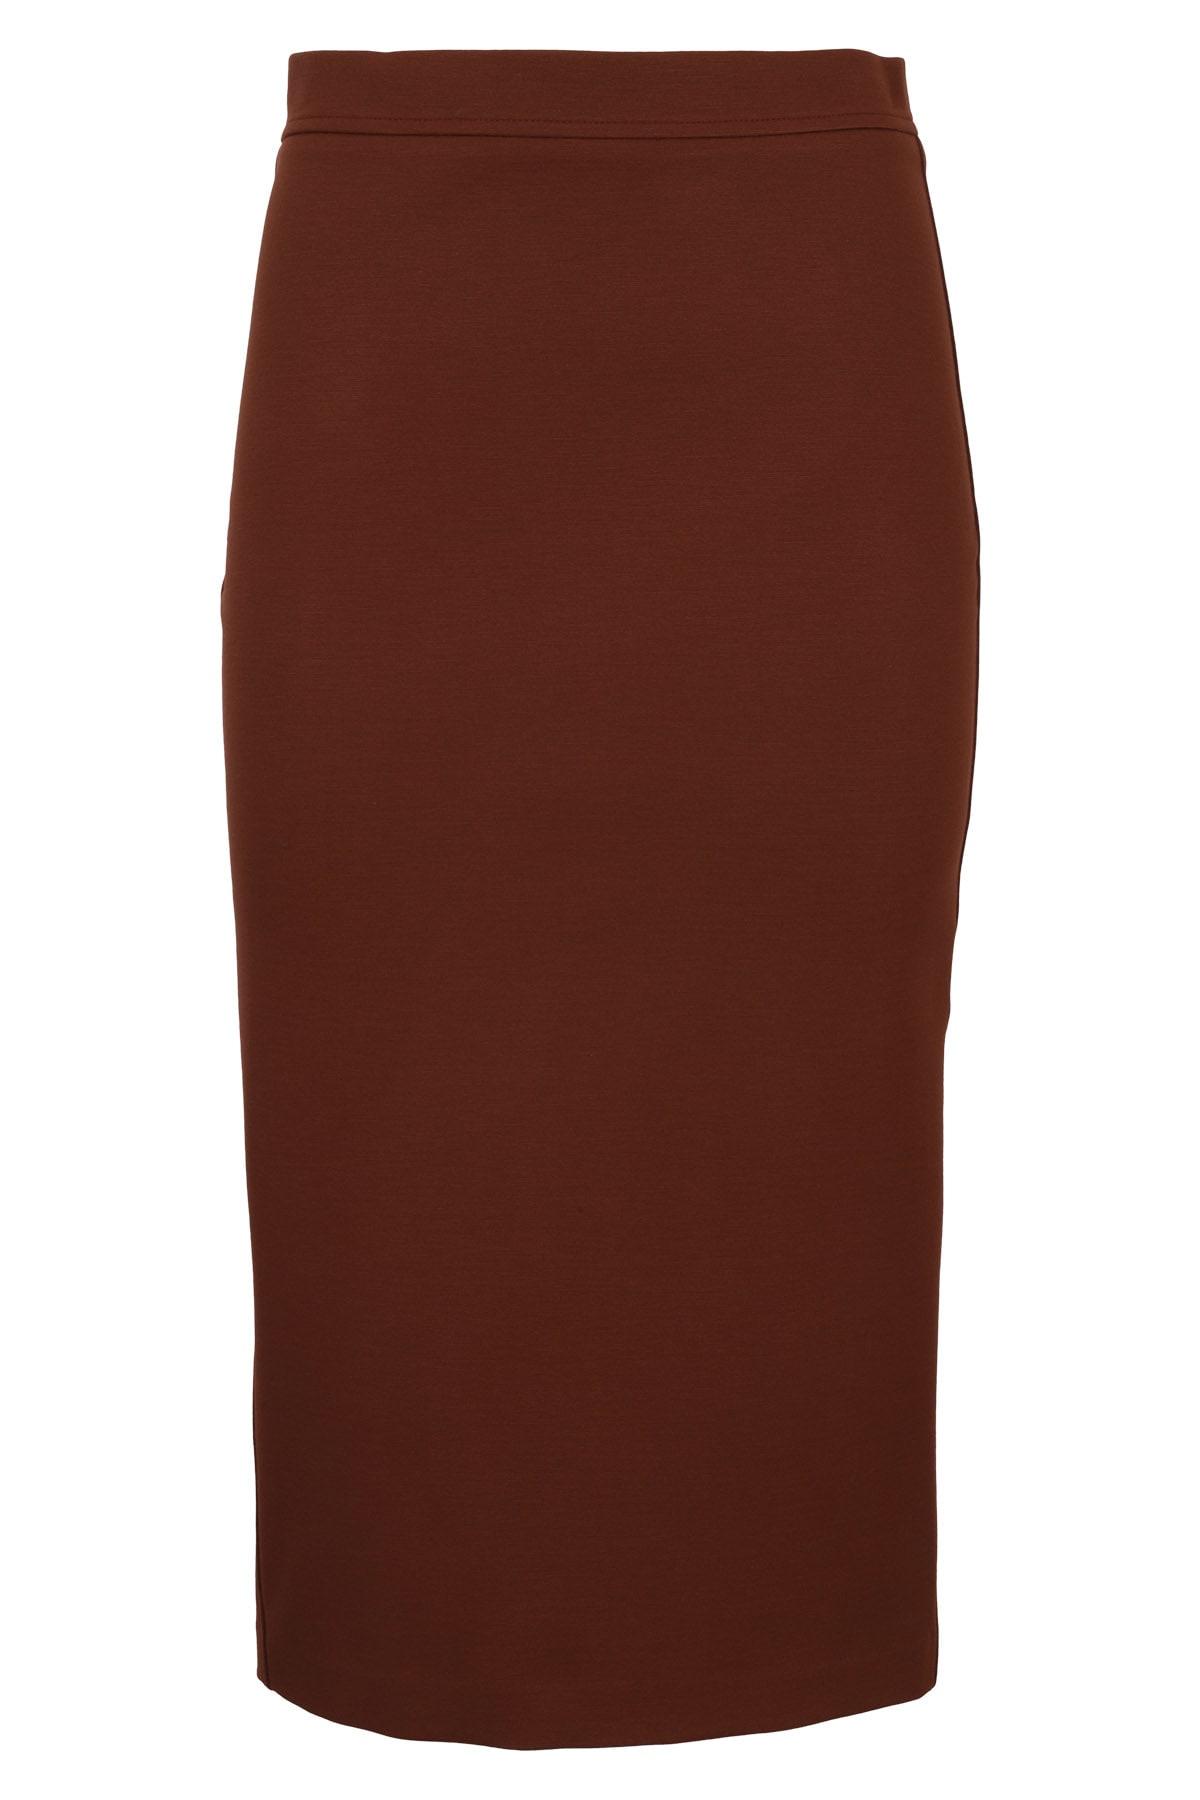 Jucca Skirt